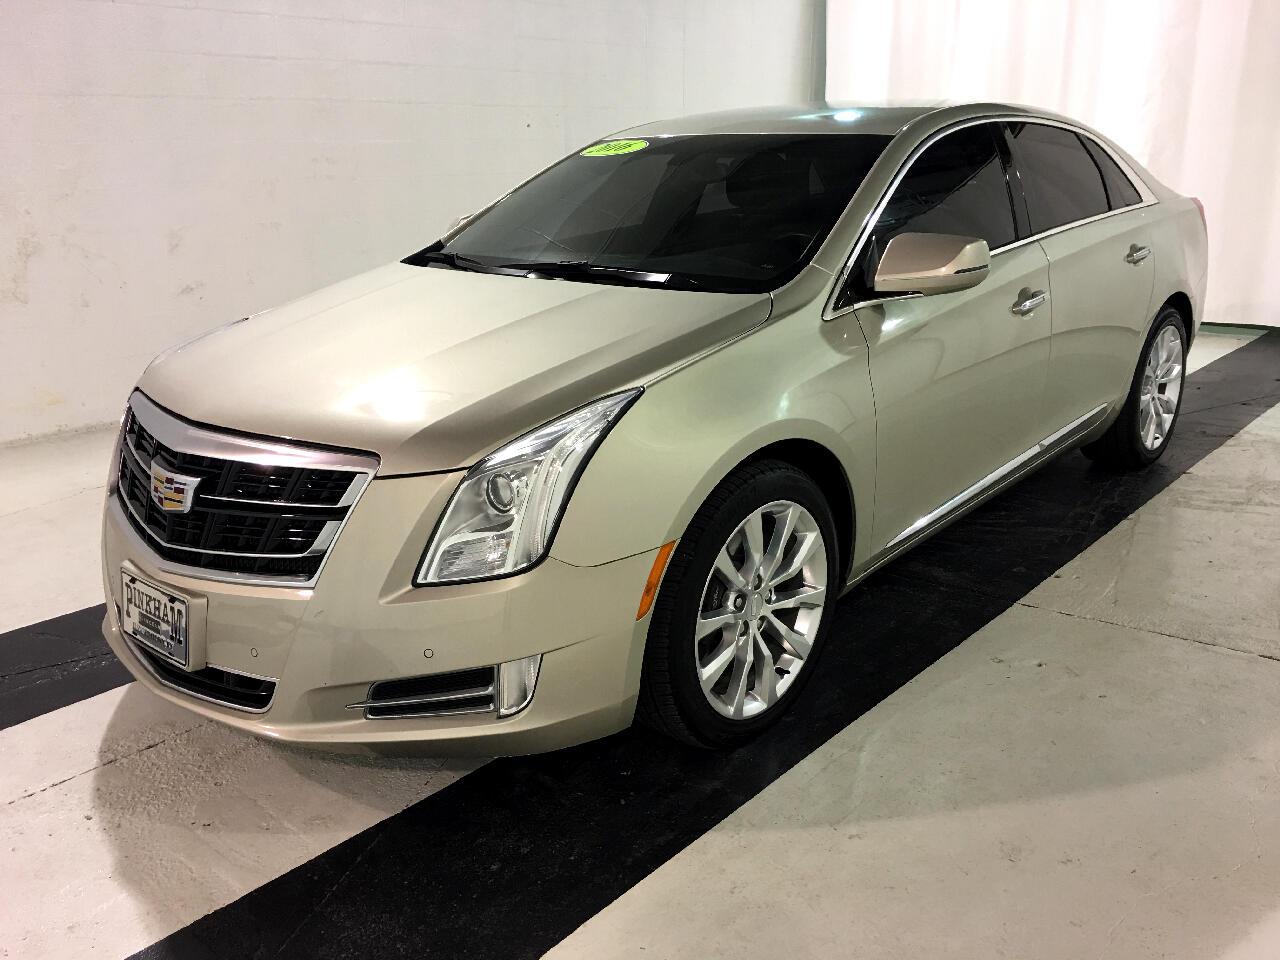 2016 Cadillac XTS 4dr Sdn Luxury AWD